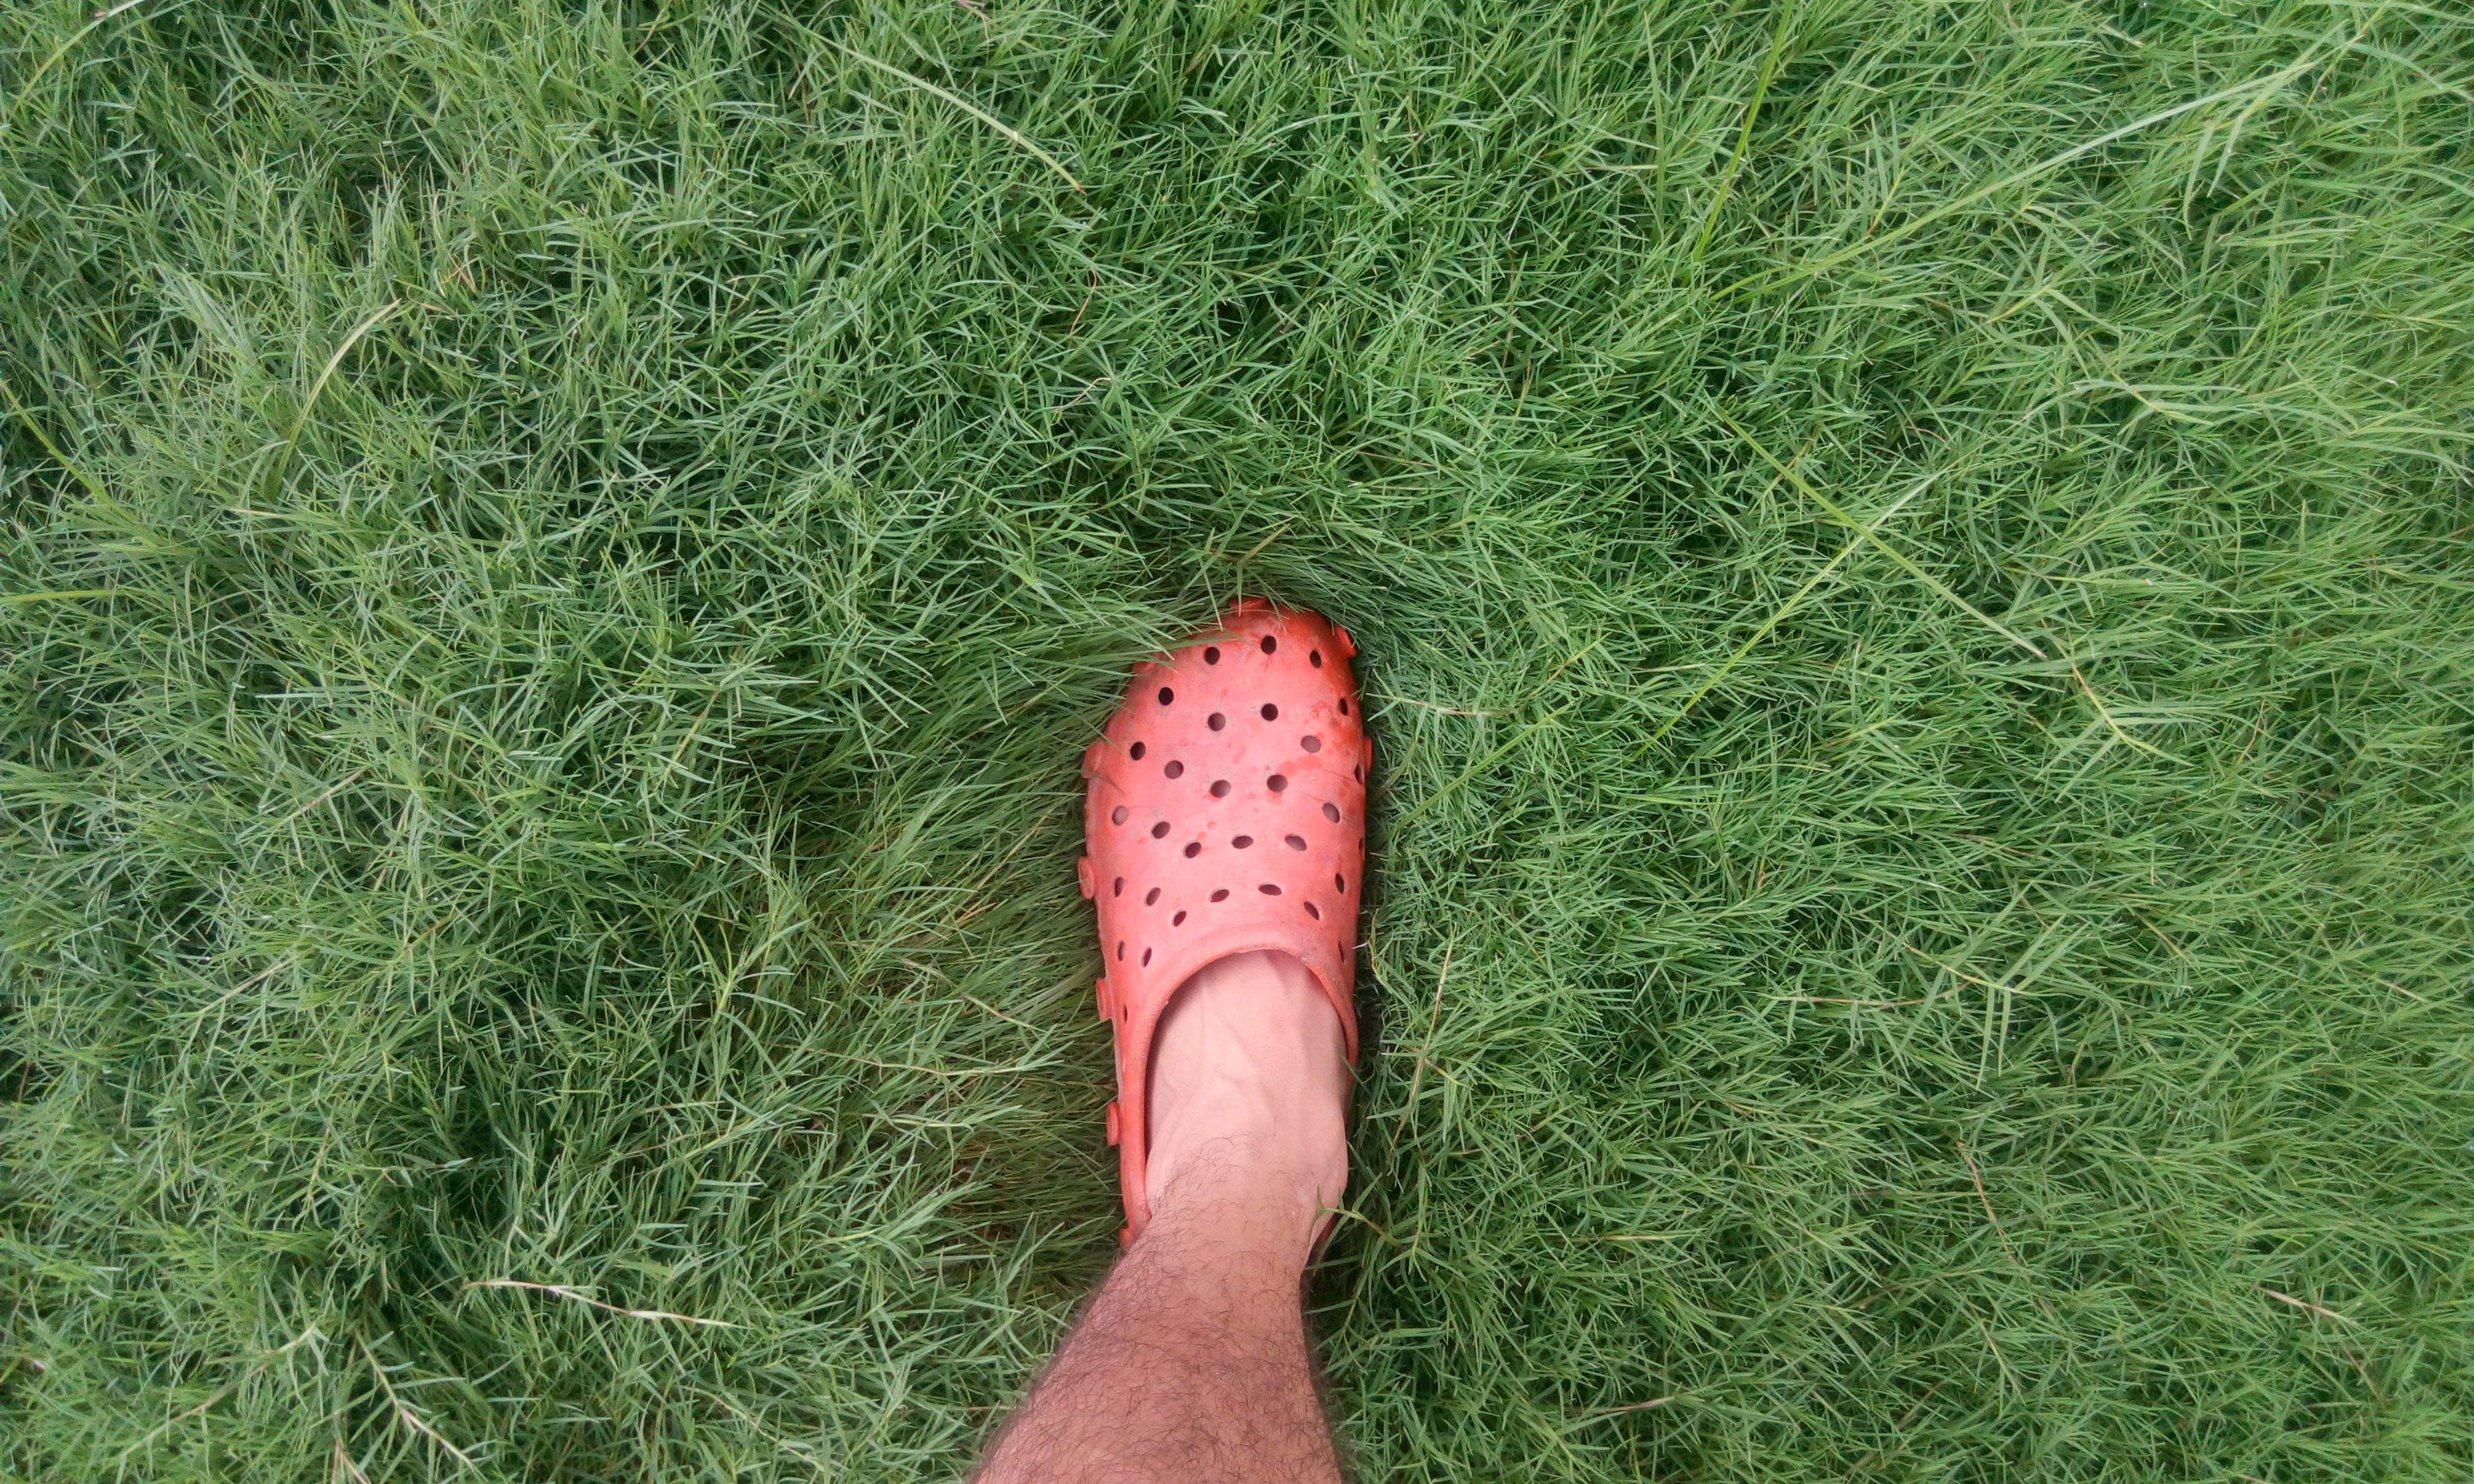 Person Wearing Orange Clog Shoe on Grass Field